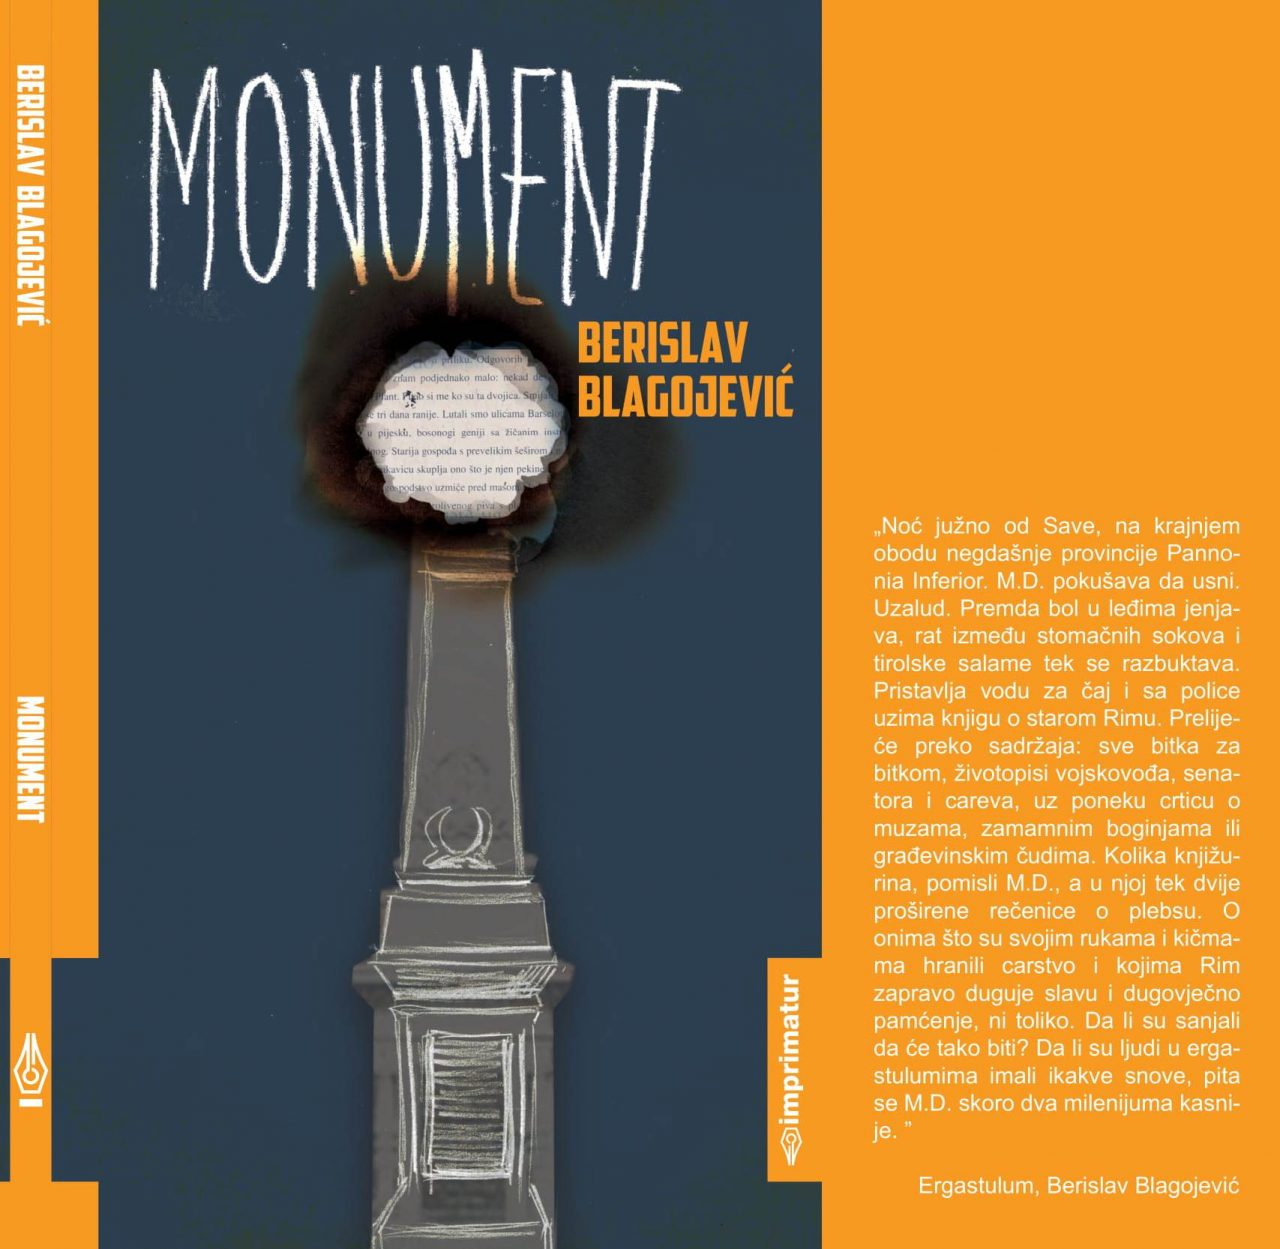 cropped-monument-korice.jpg